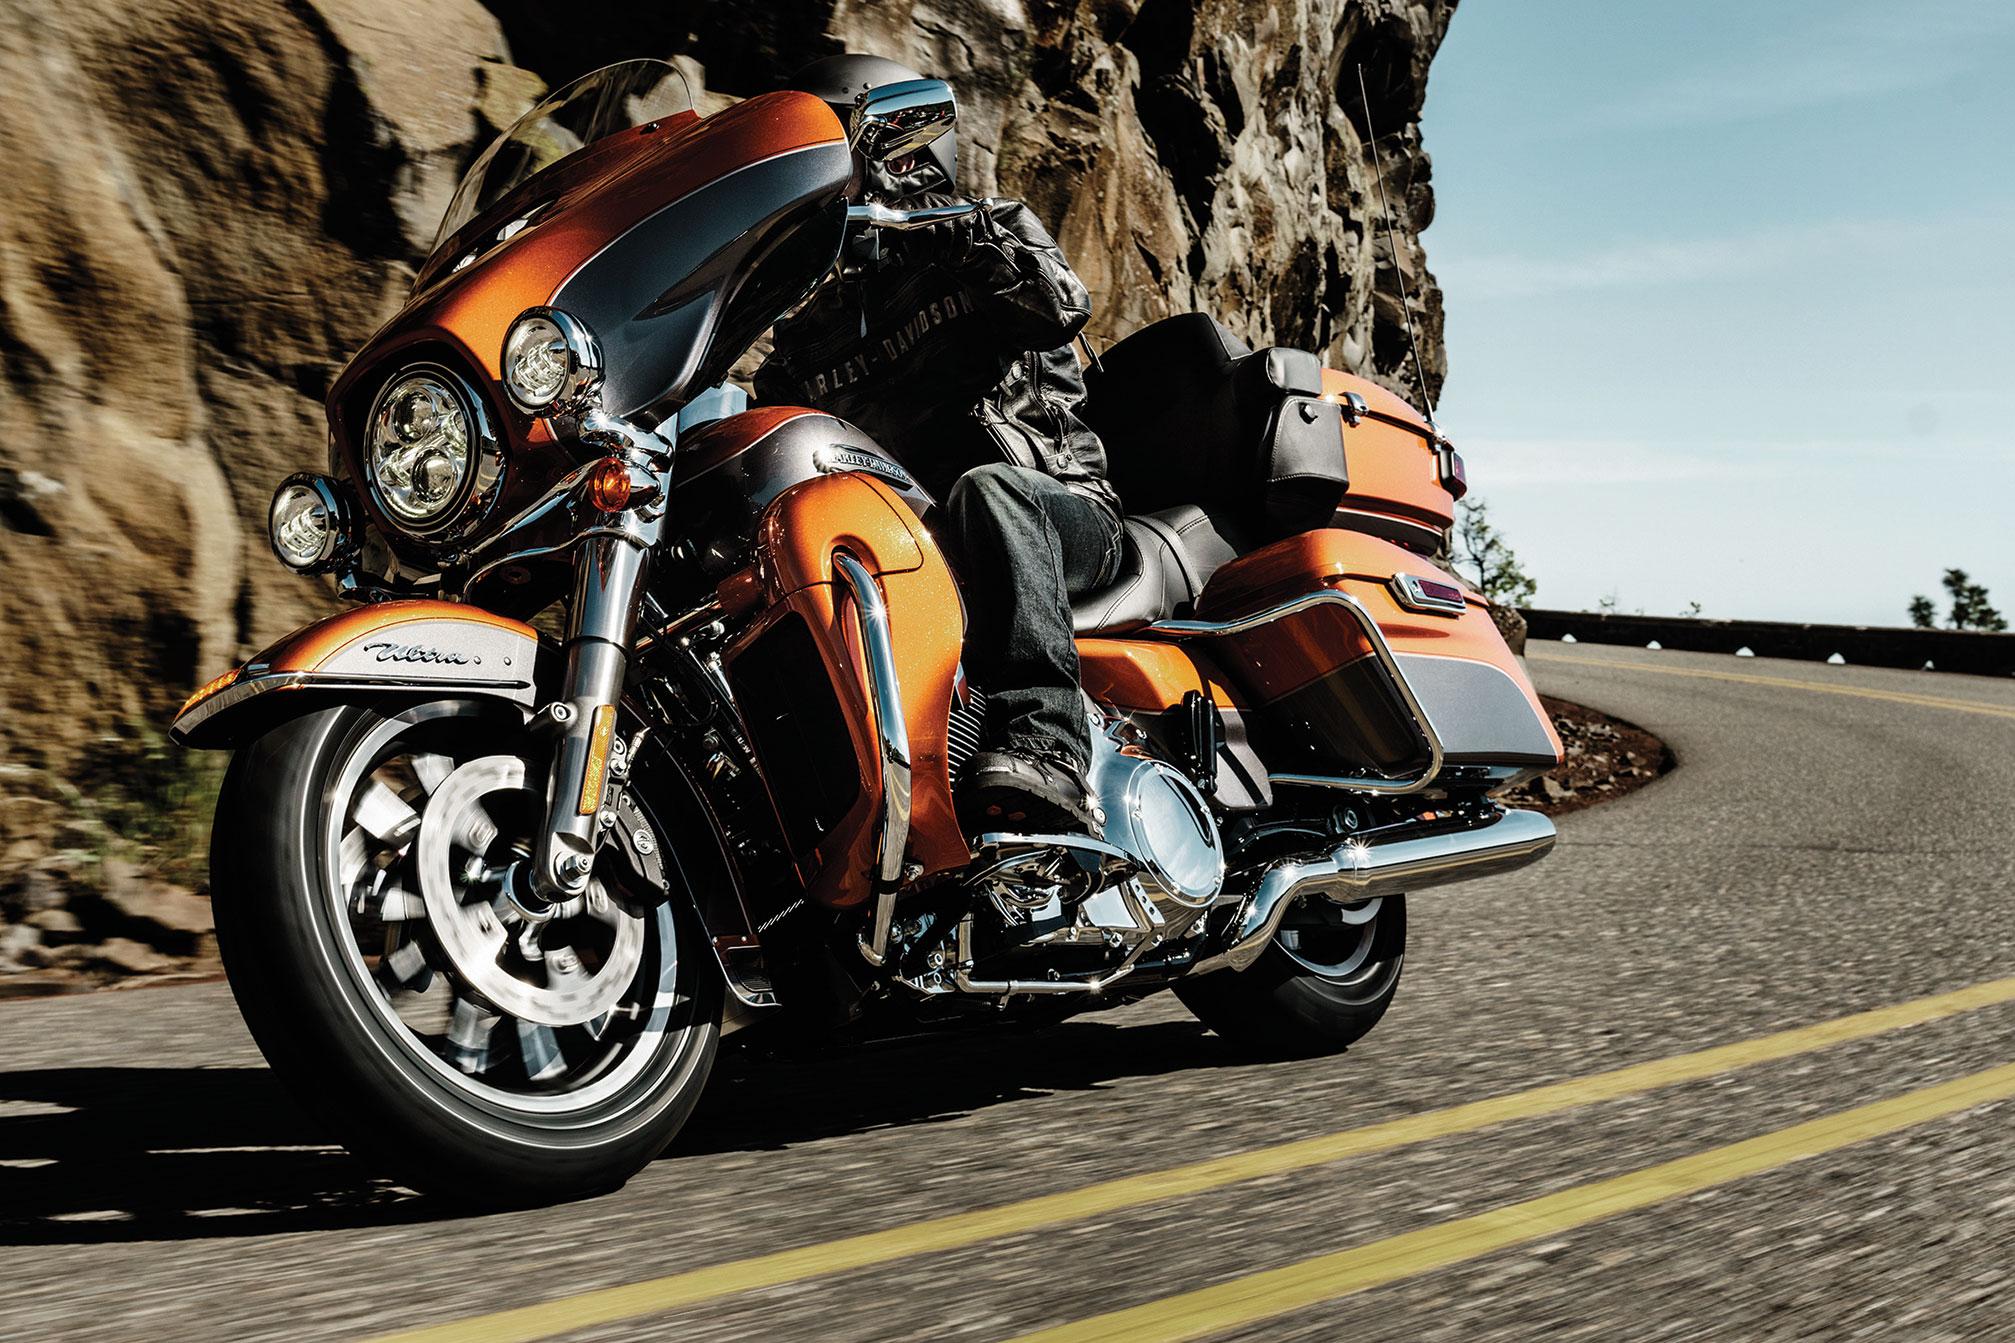 Top Wallpaper High Resolution Harley Davidson - 86  Trends_778185.jpg